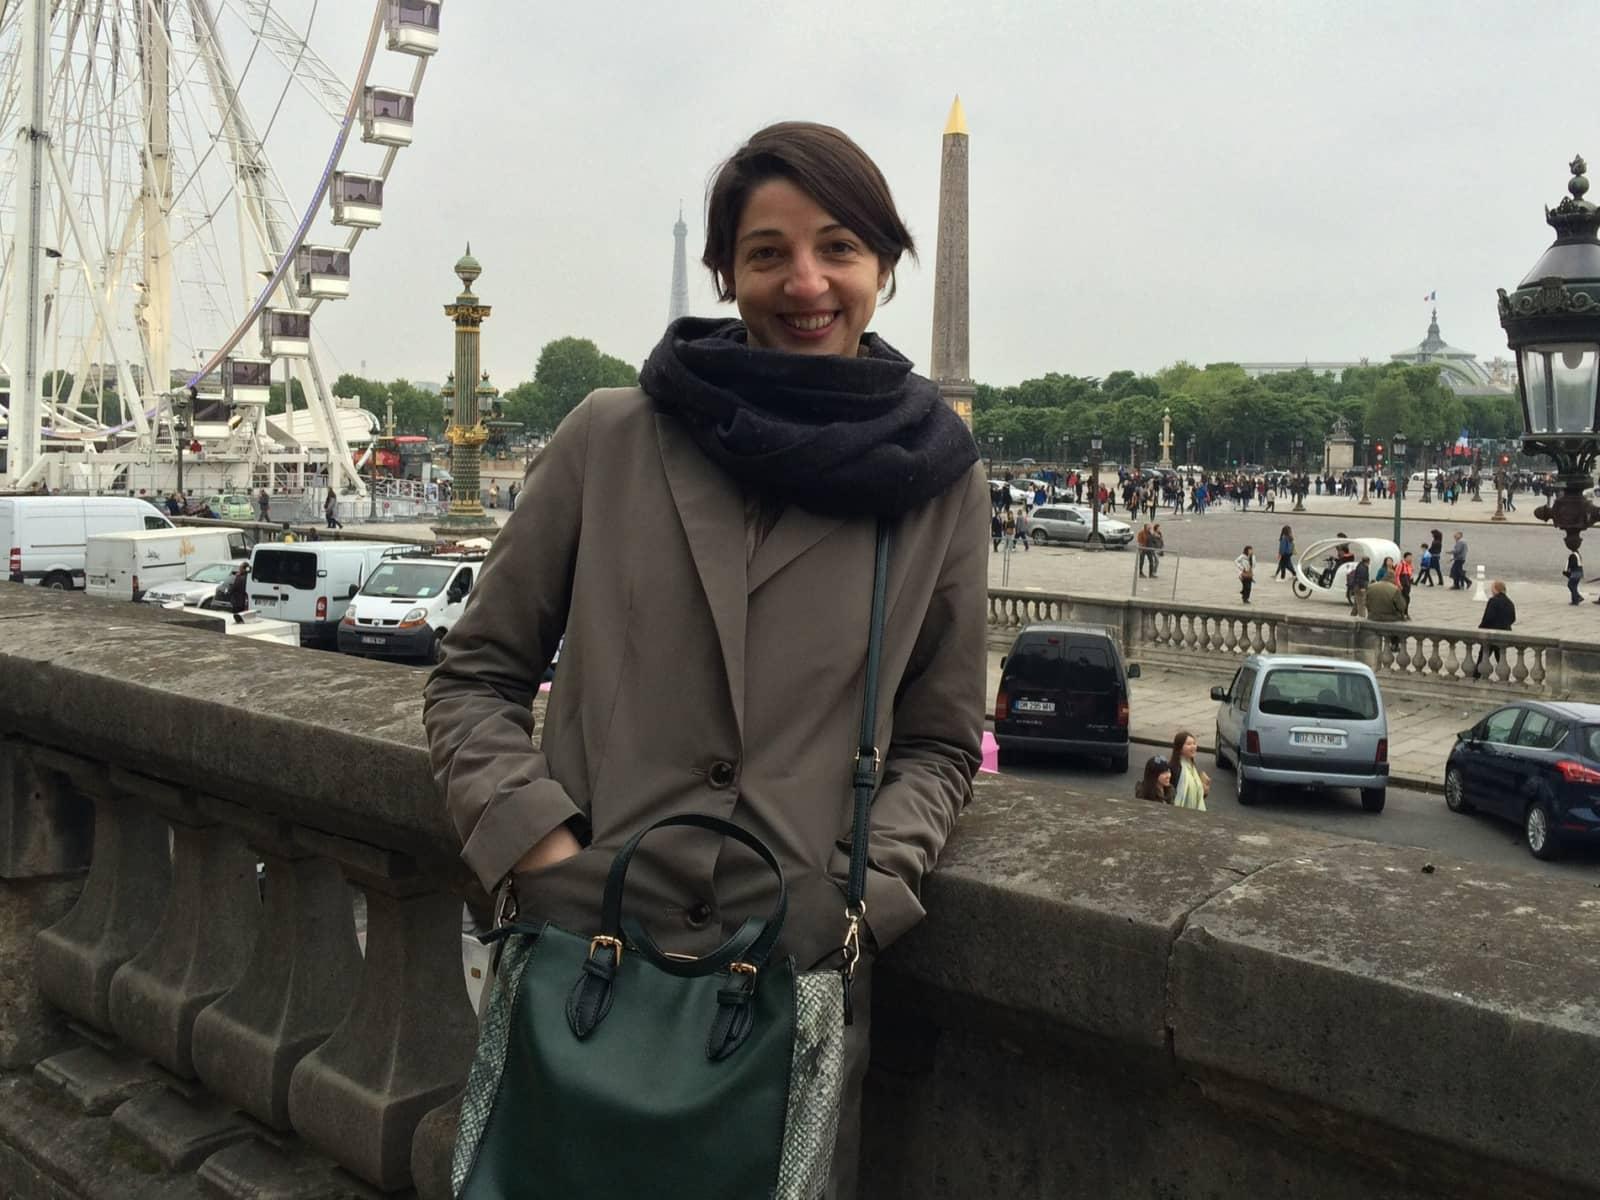 Elena from Paris, France